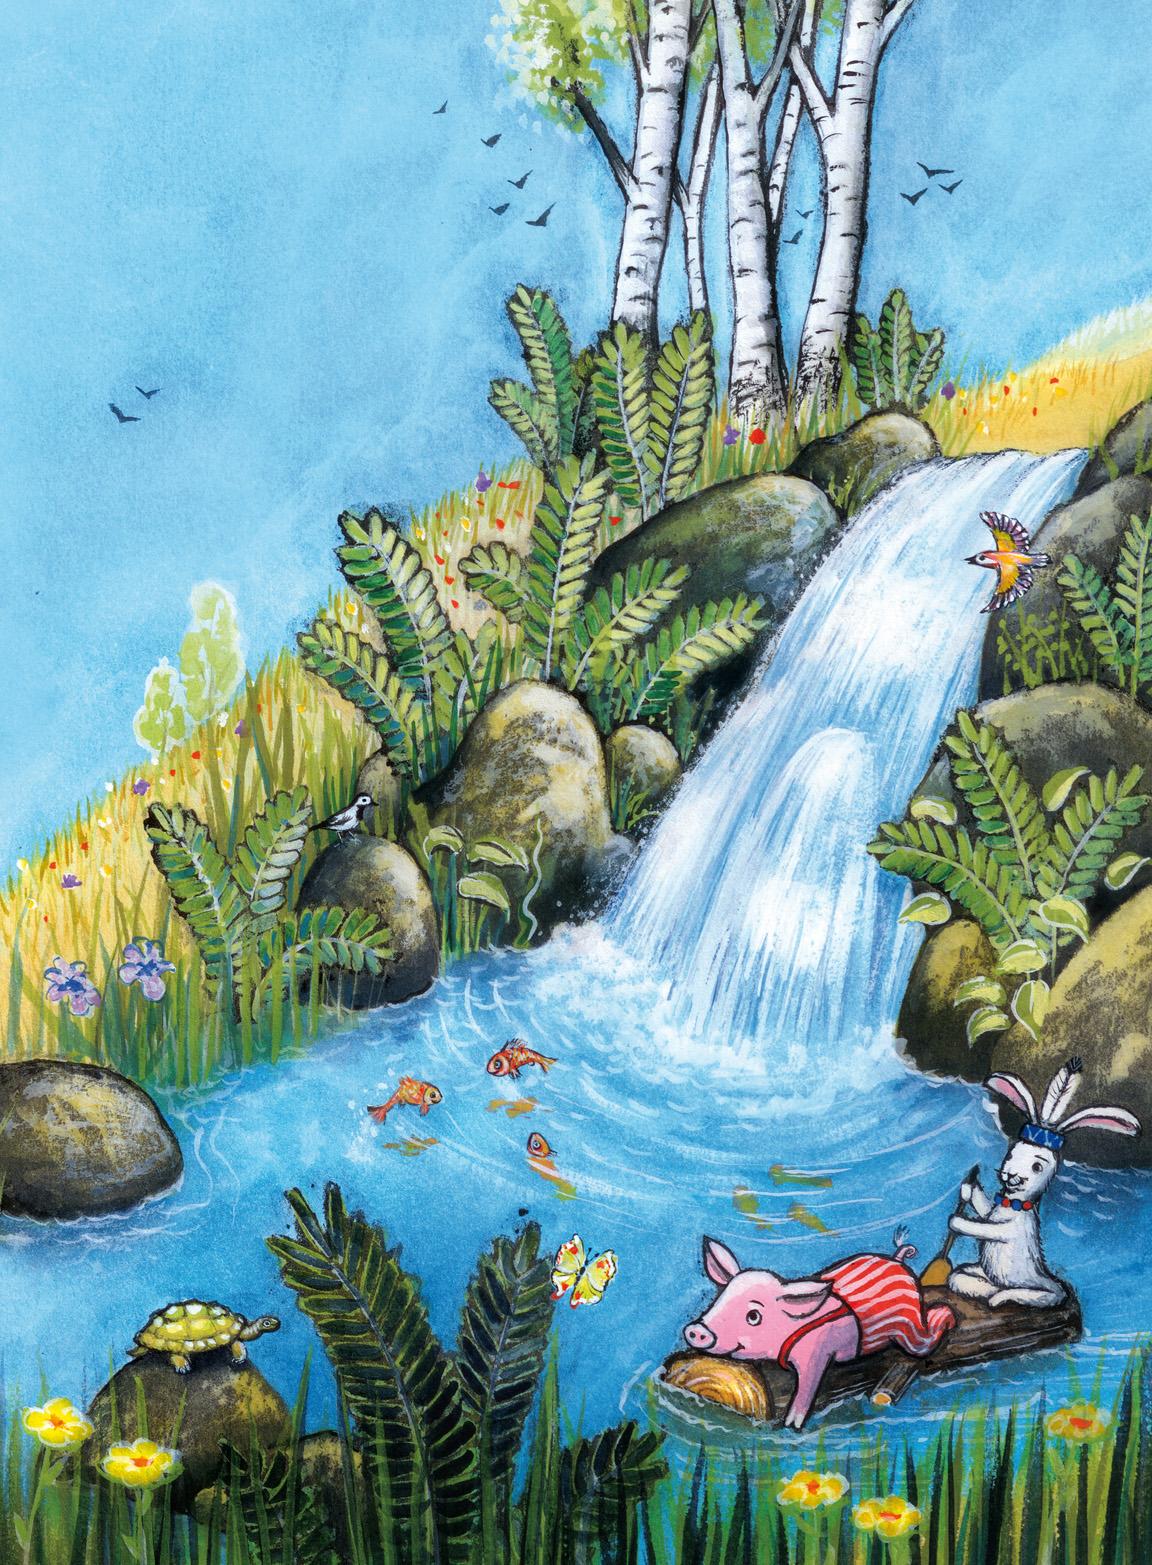 Lulus Wasserfall im Traumland